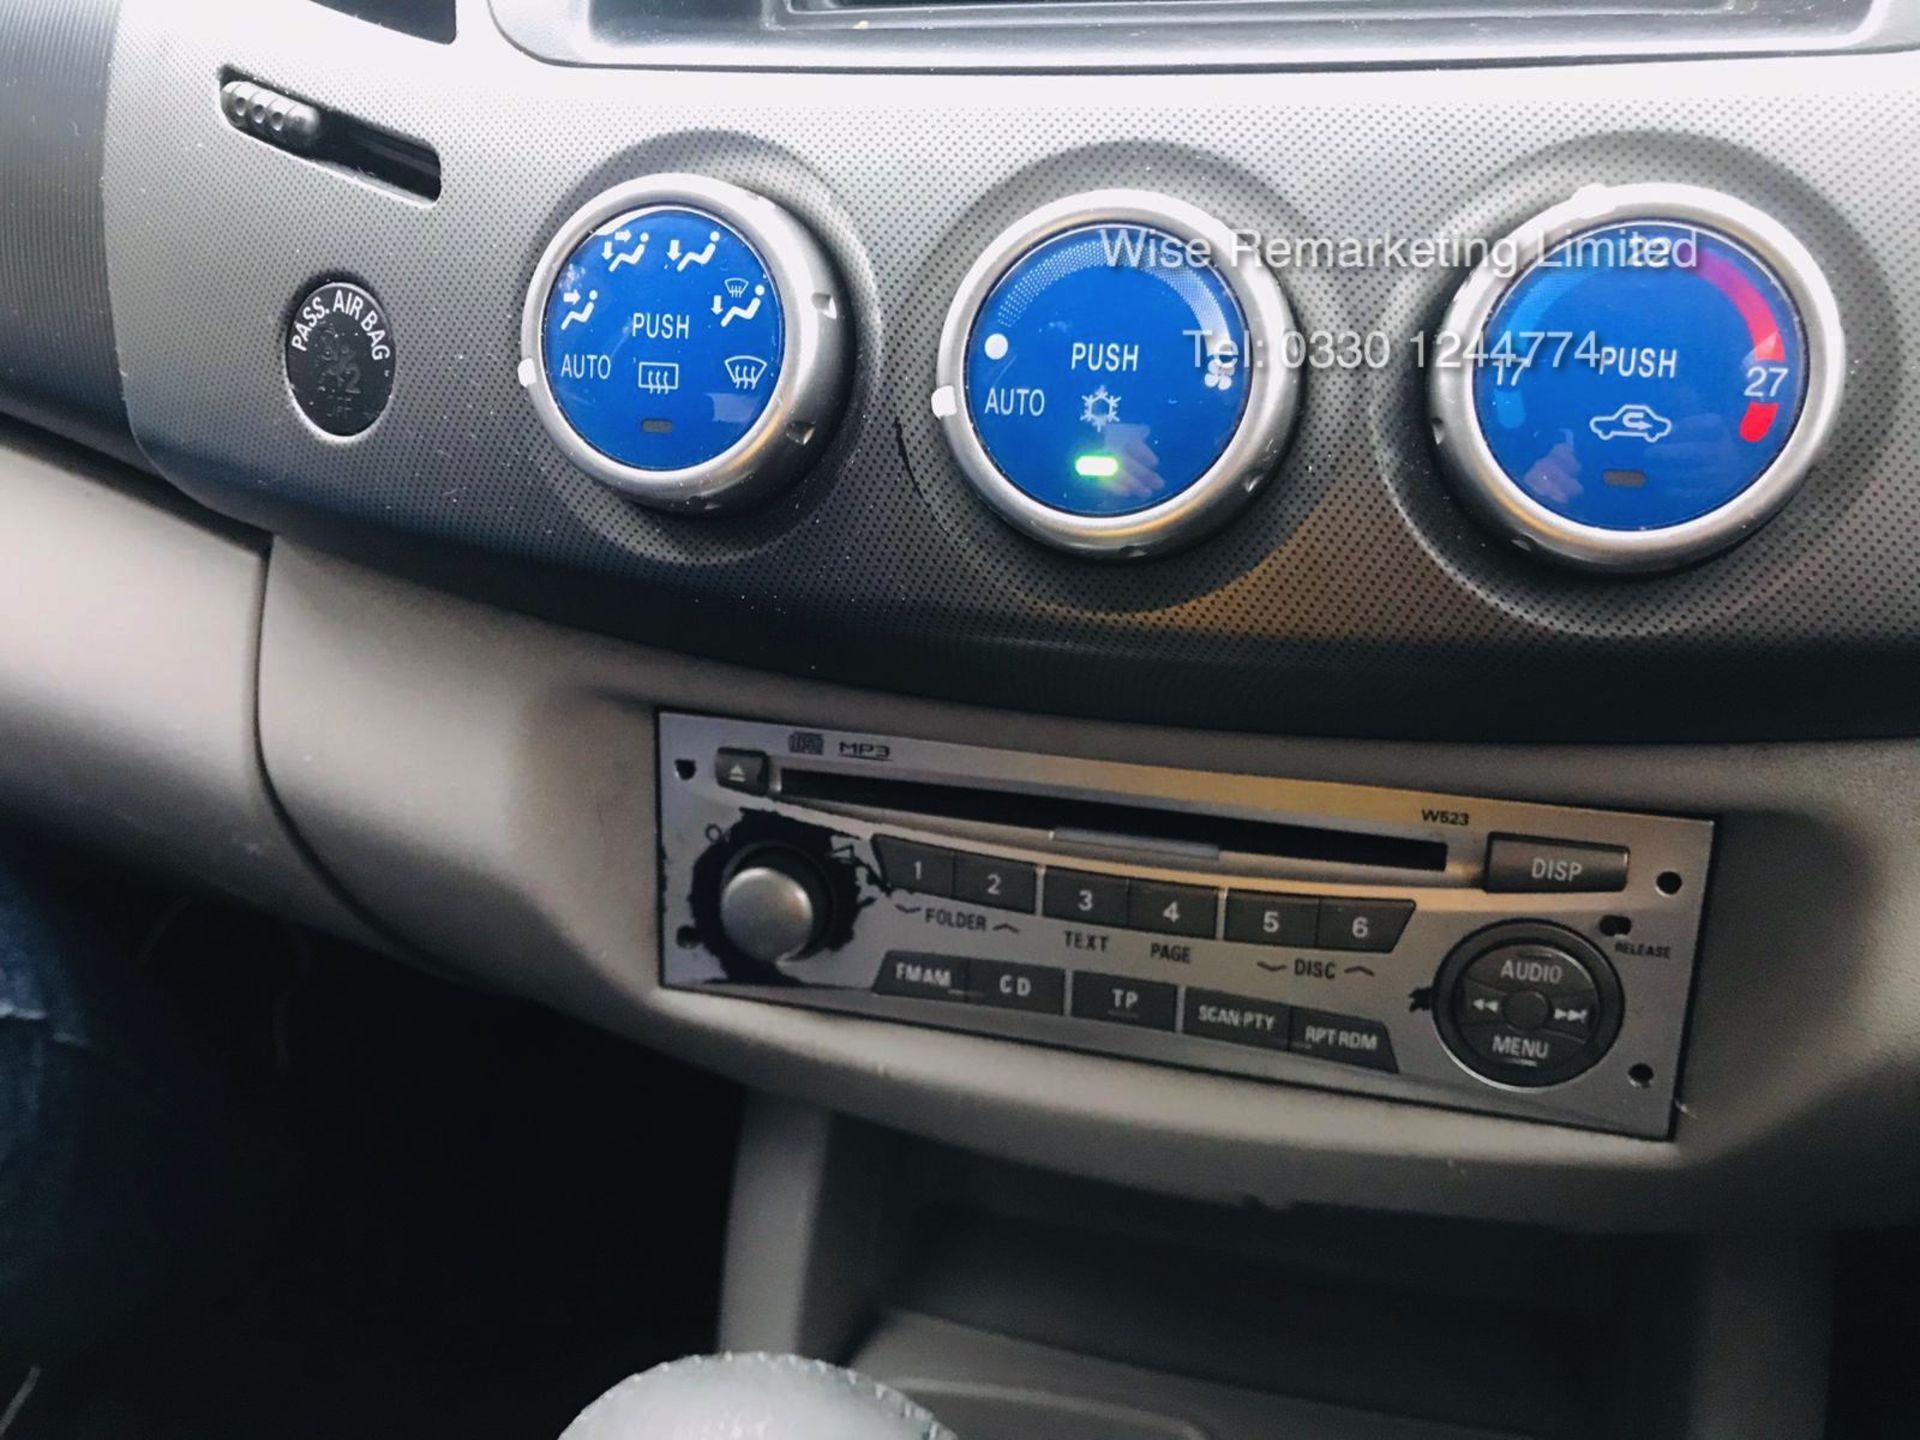 Mitsubishi L200 2.5 DI-D Warrior Auto - 2008 08 Reg - Full Leather - SAVE 20% NO VAT - Image 12 of 26